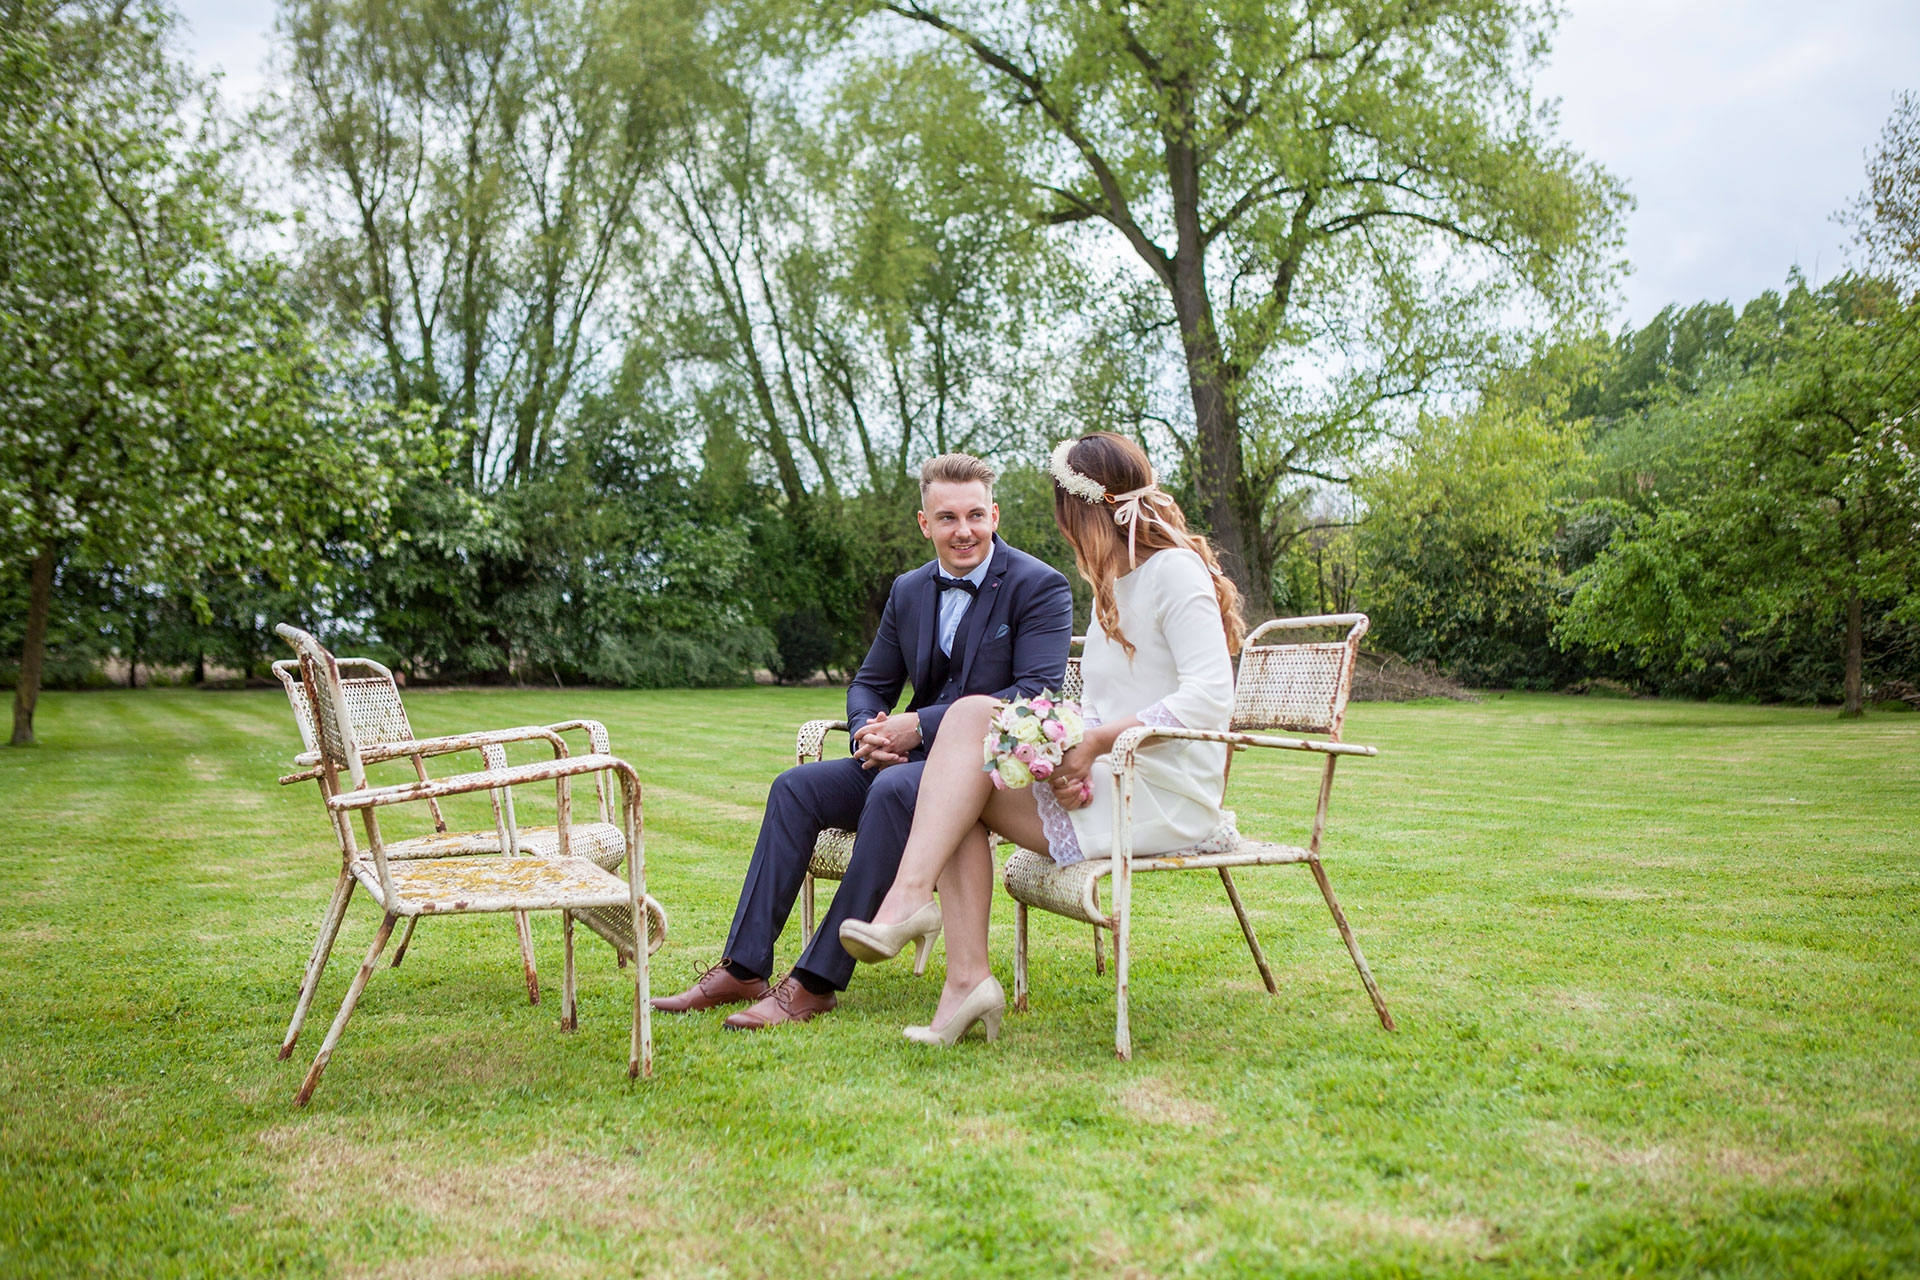 particuliers-evenements-mariages-oui-zelie&valentin-17